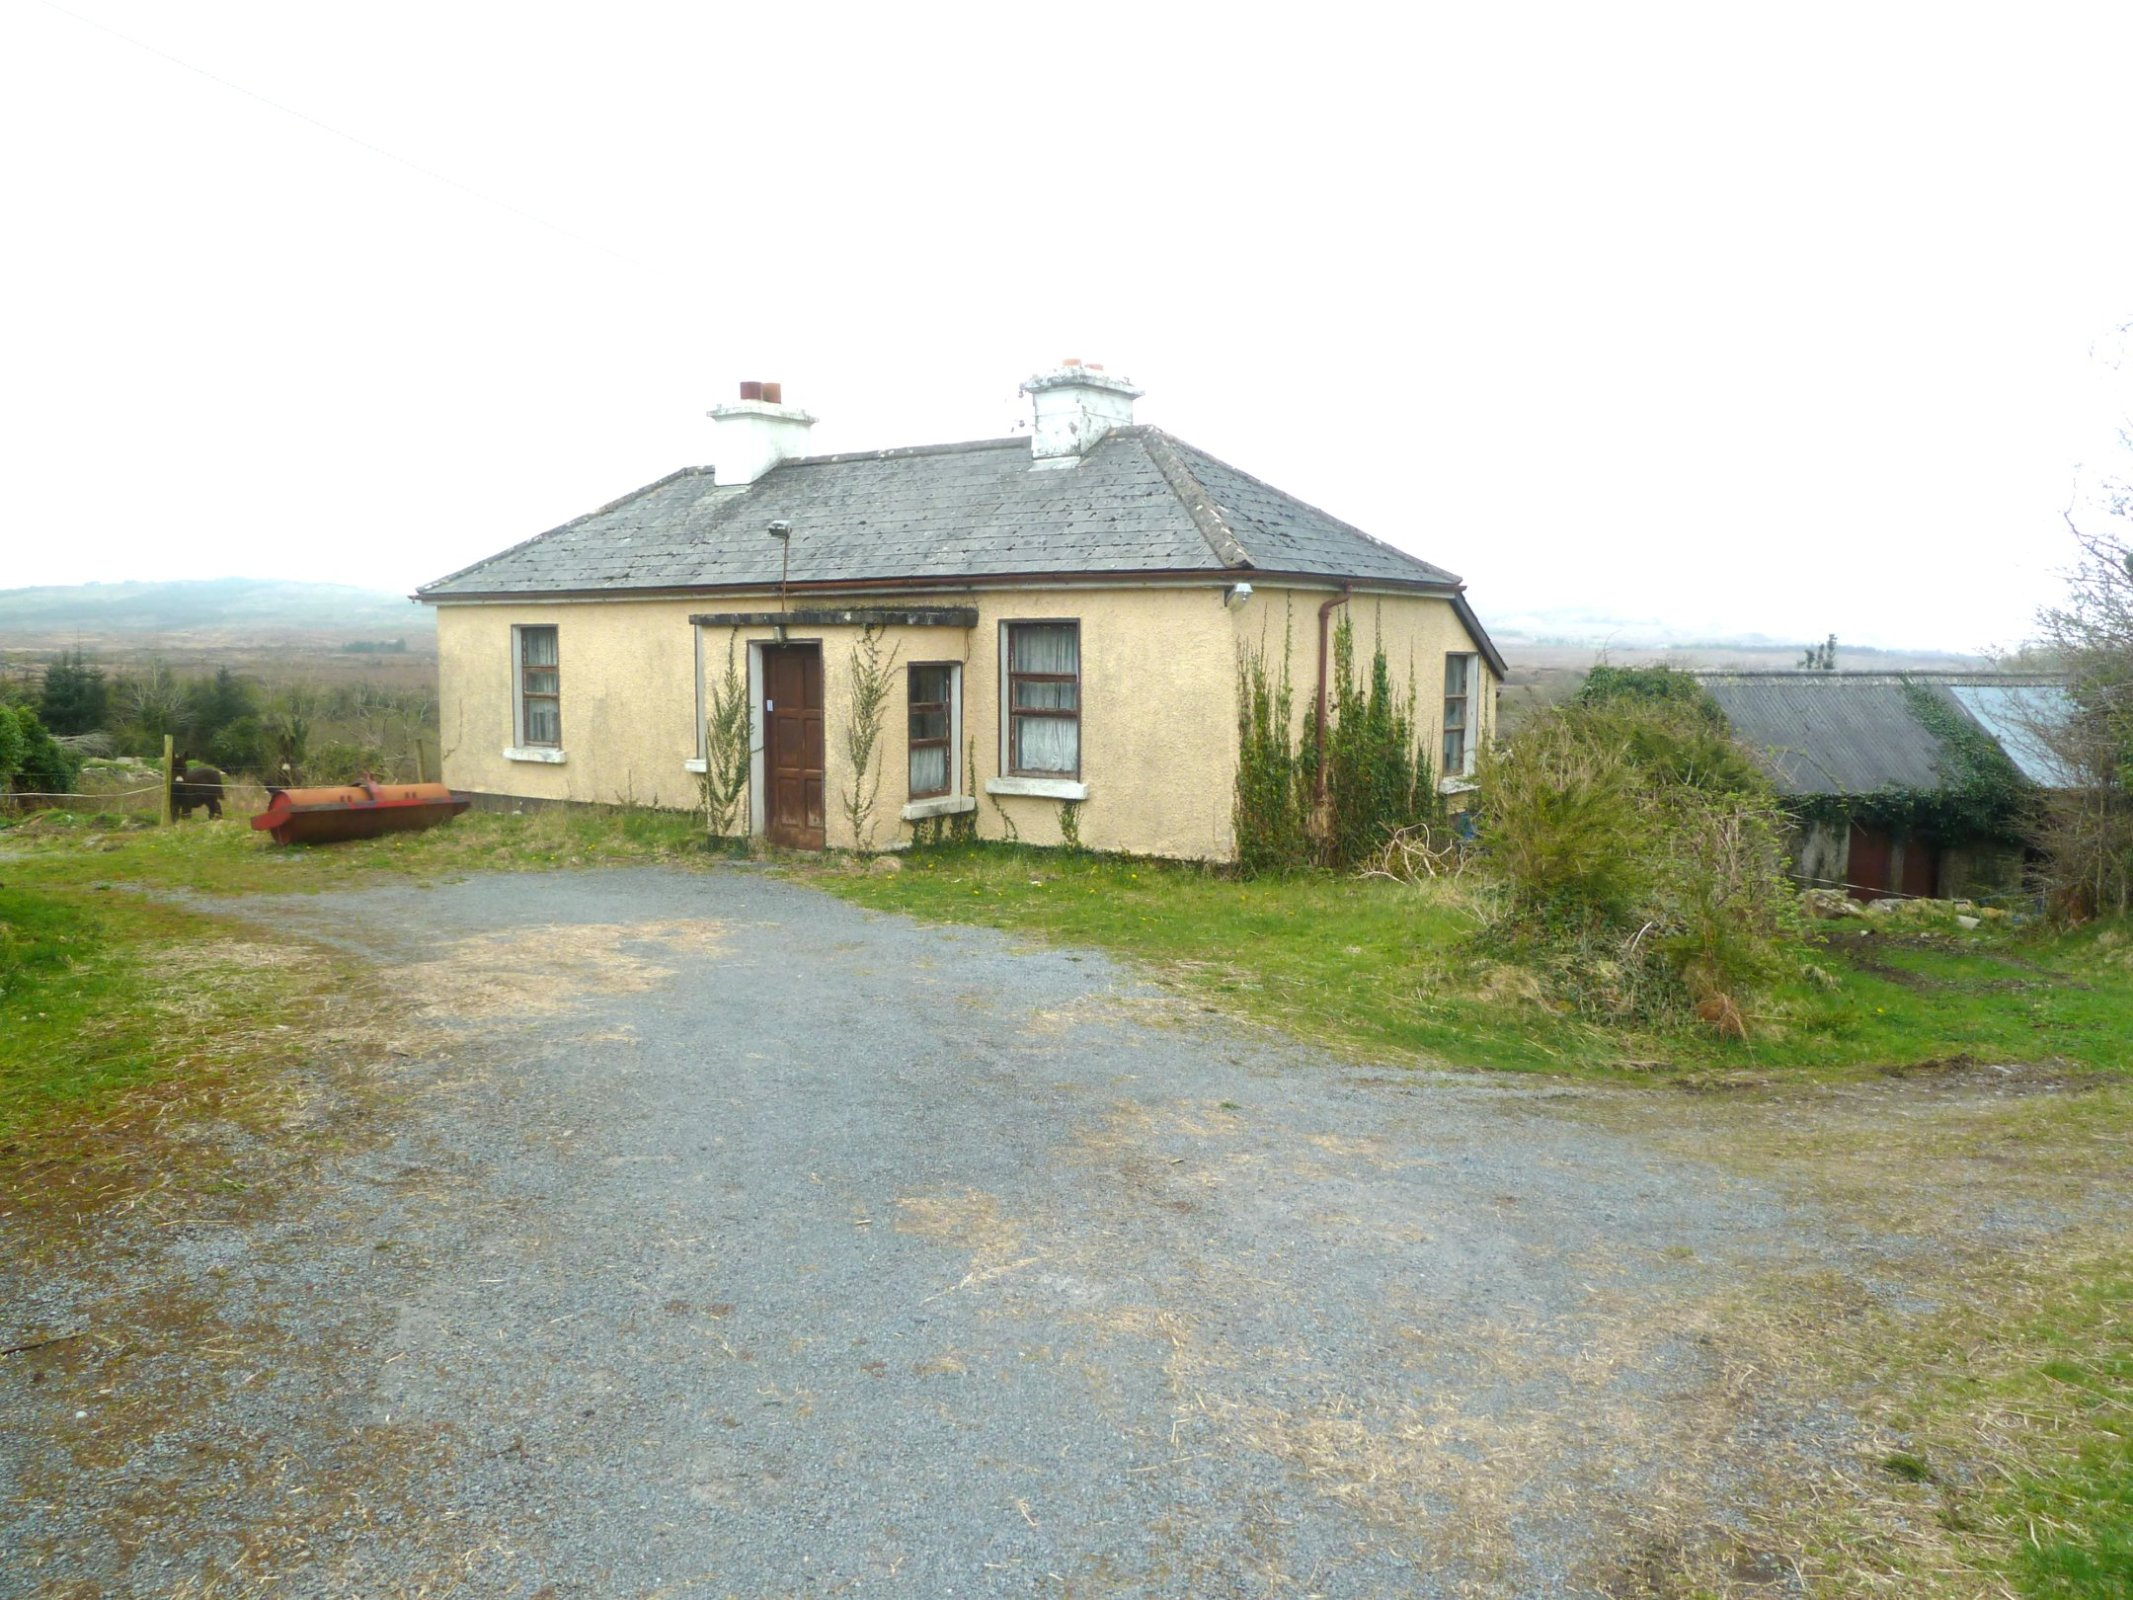 Cauranne Lower Parke, Castlebar, Co. Mayo